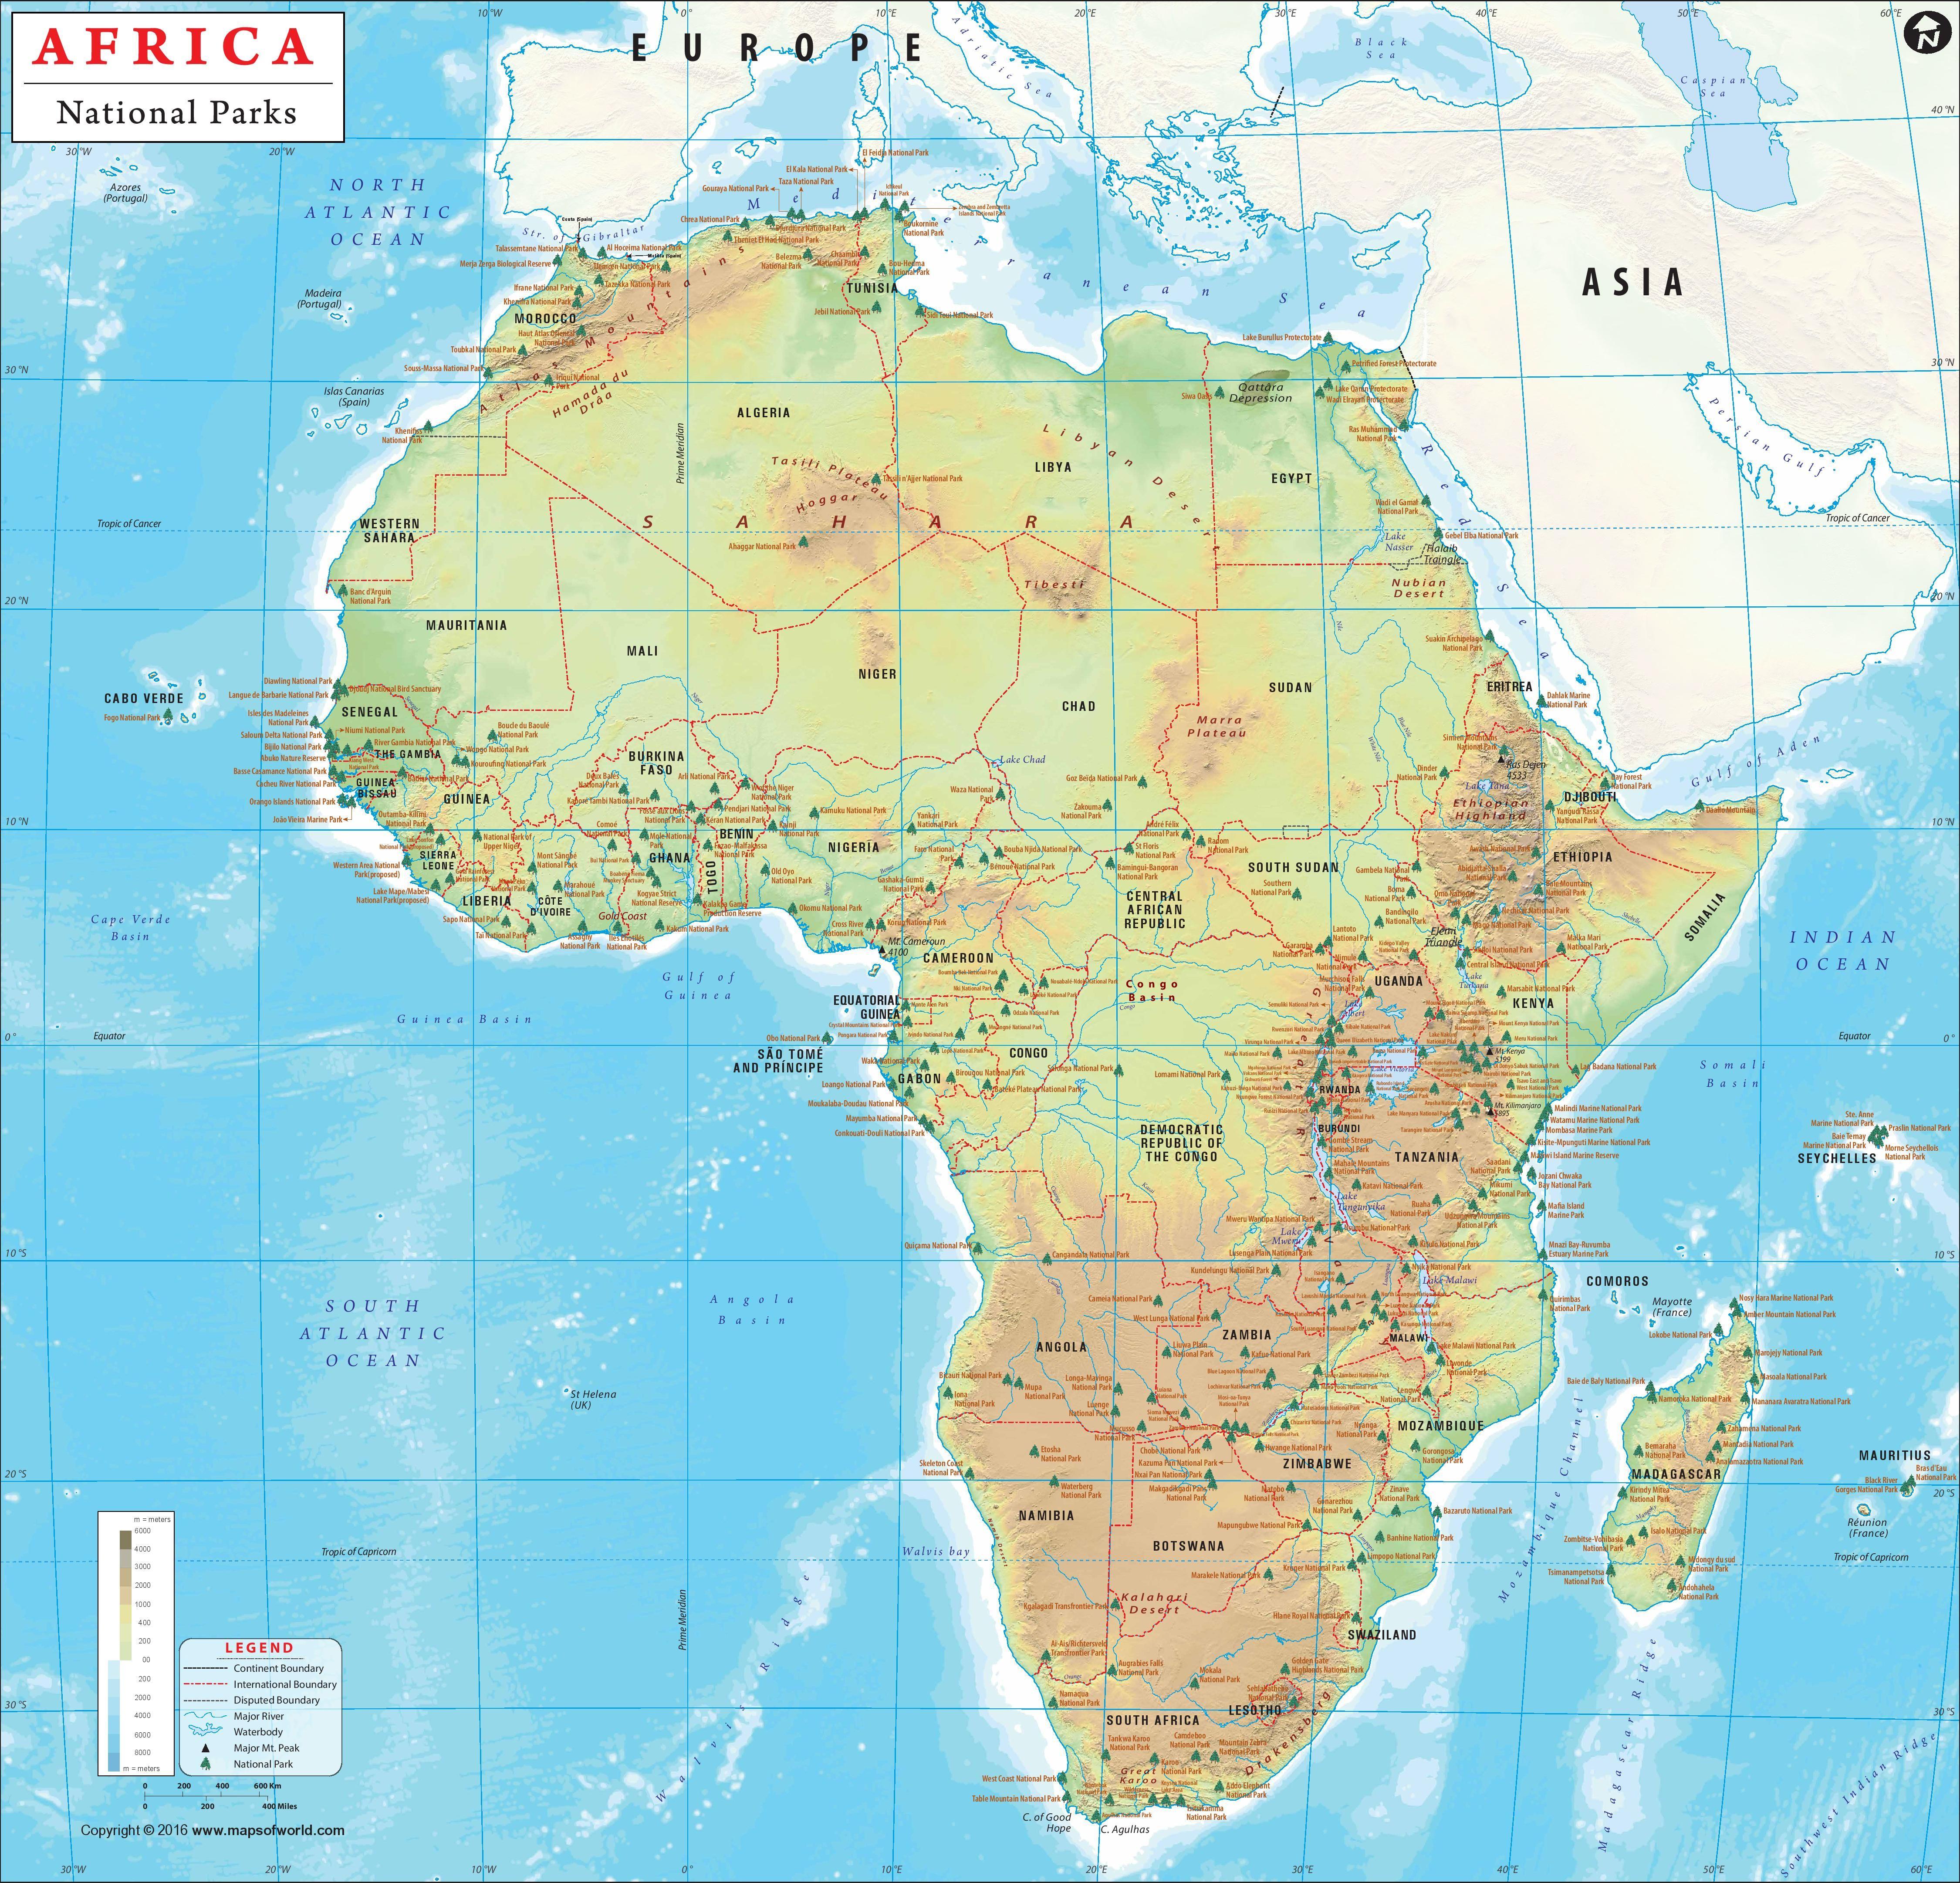 Pin von MapsofWorld - Custom mapping auf Thematic maps | Pinterest